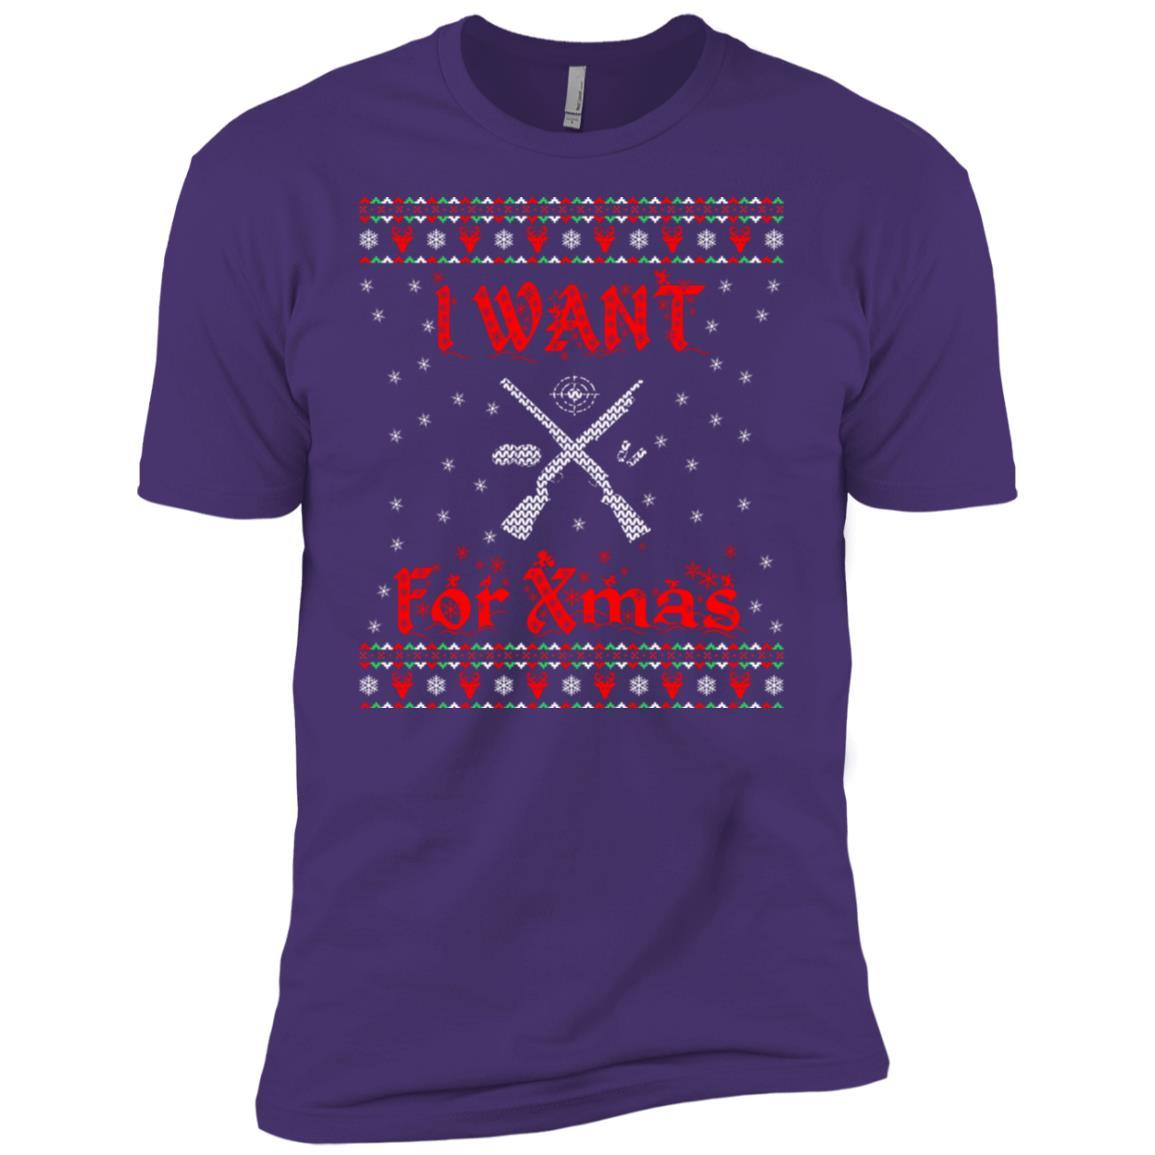 I Want Hunting For Xmas Christmas Gift Men Short Sleeve T-Shirt